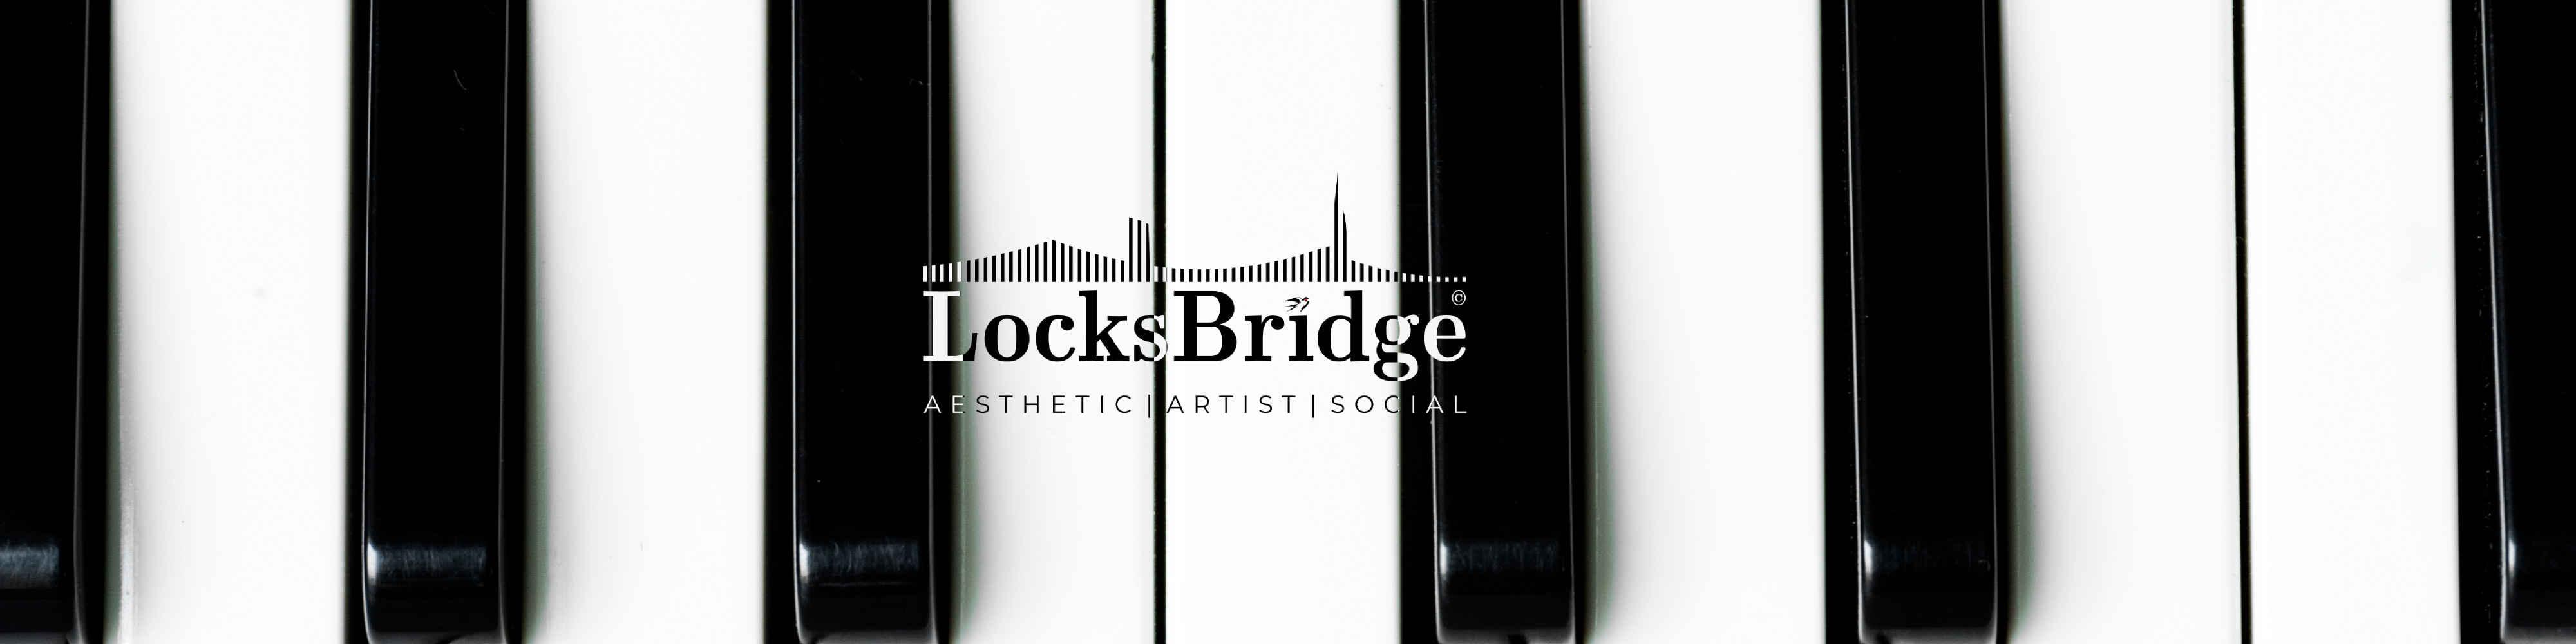 LocksBridge banner fotograf